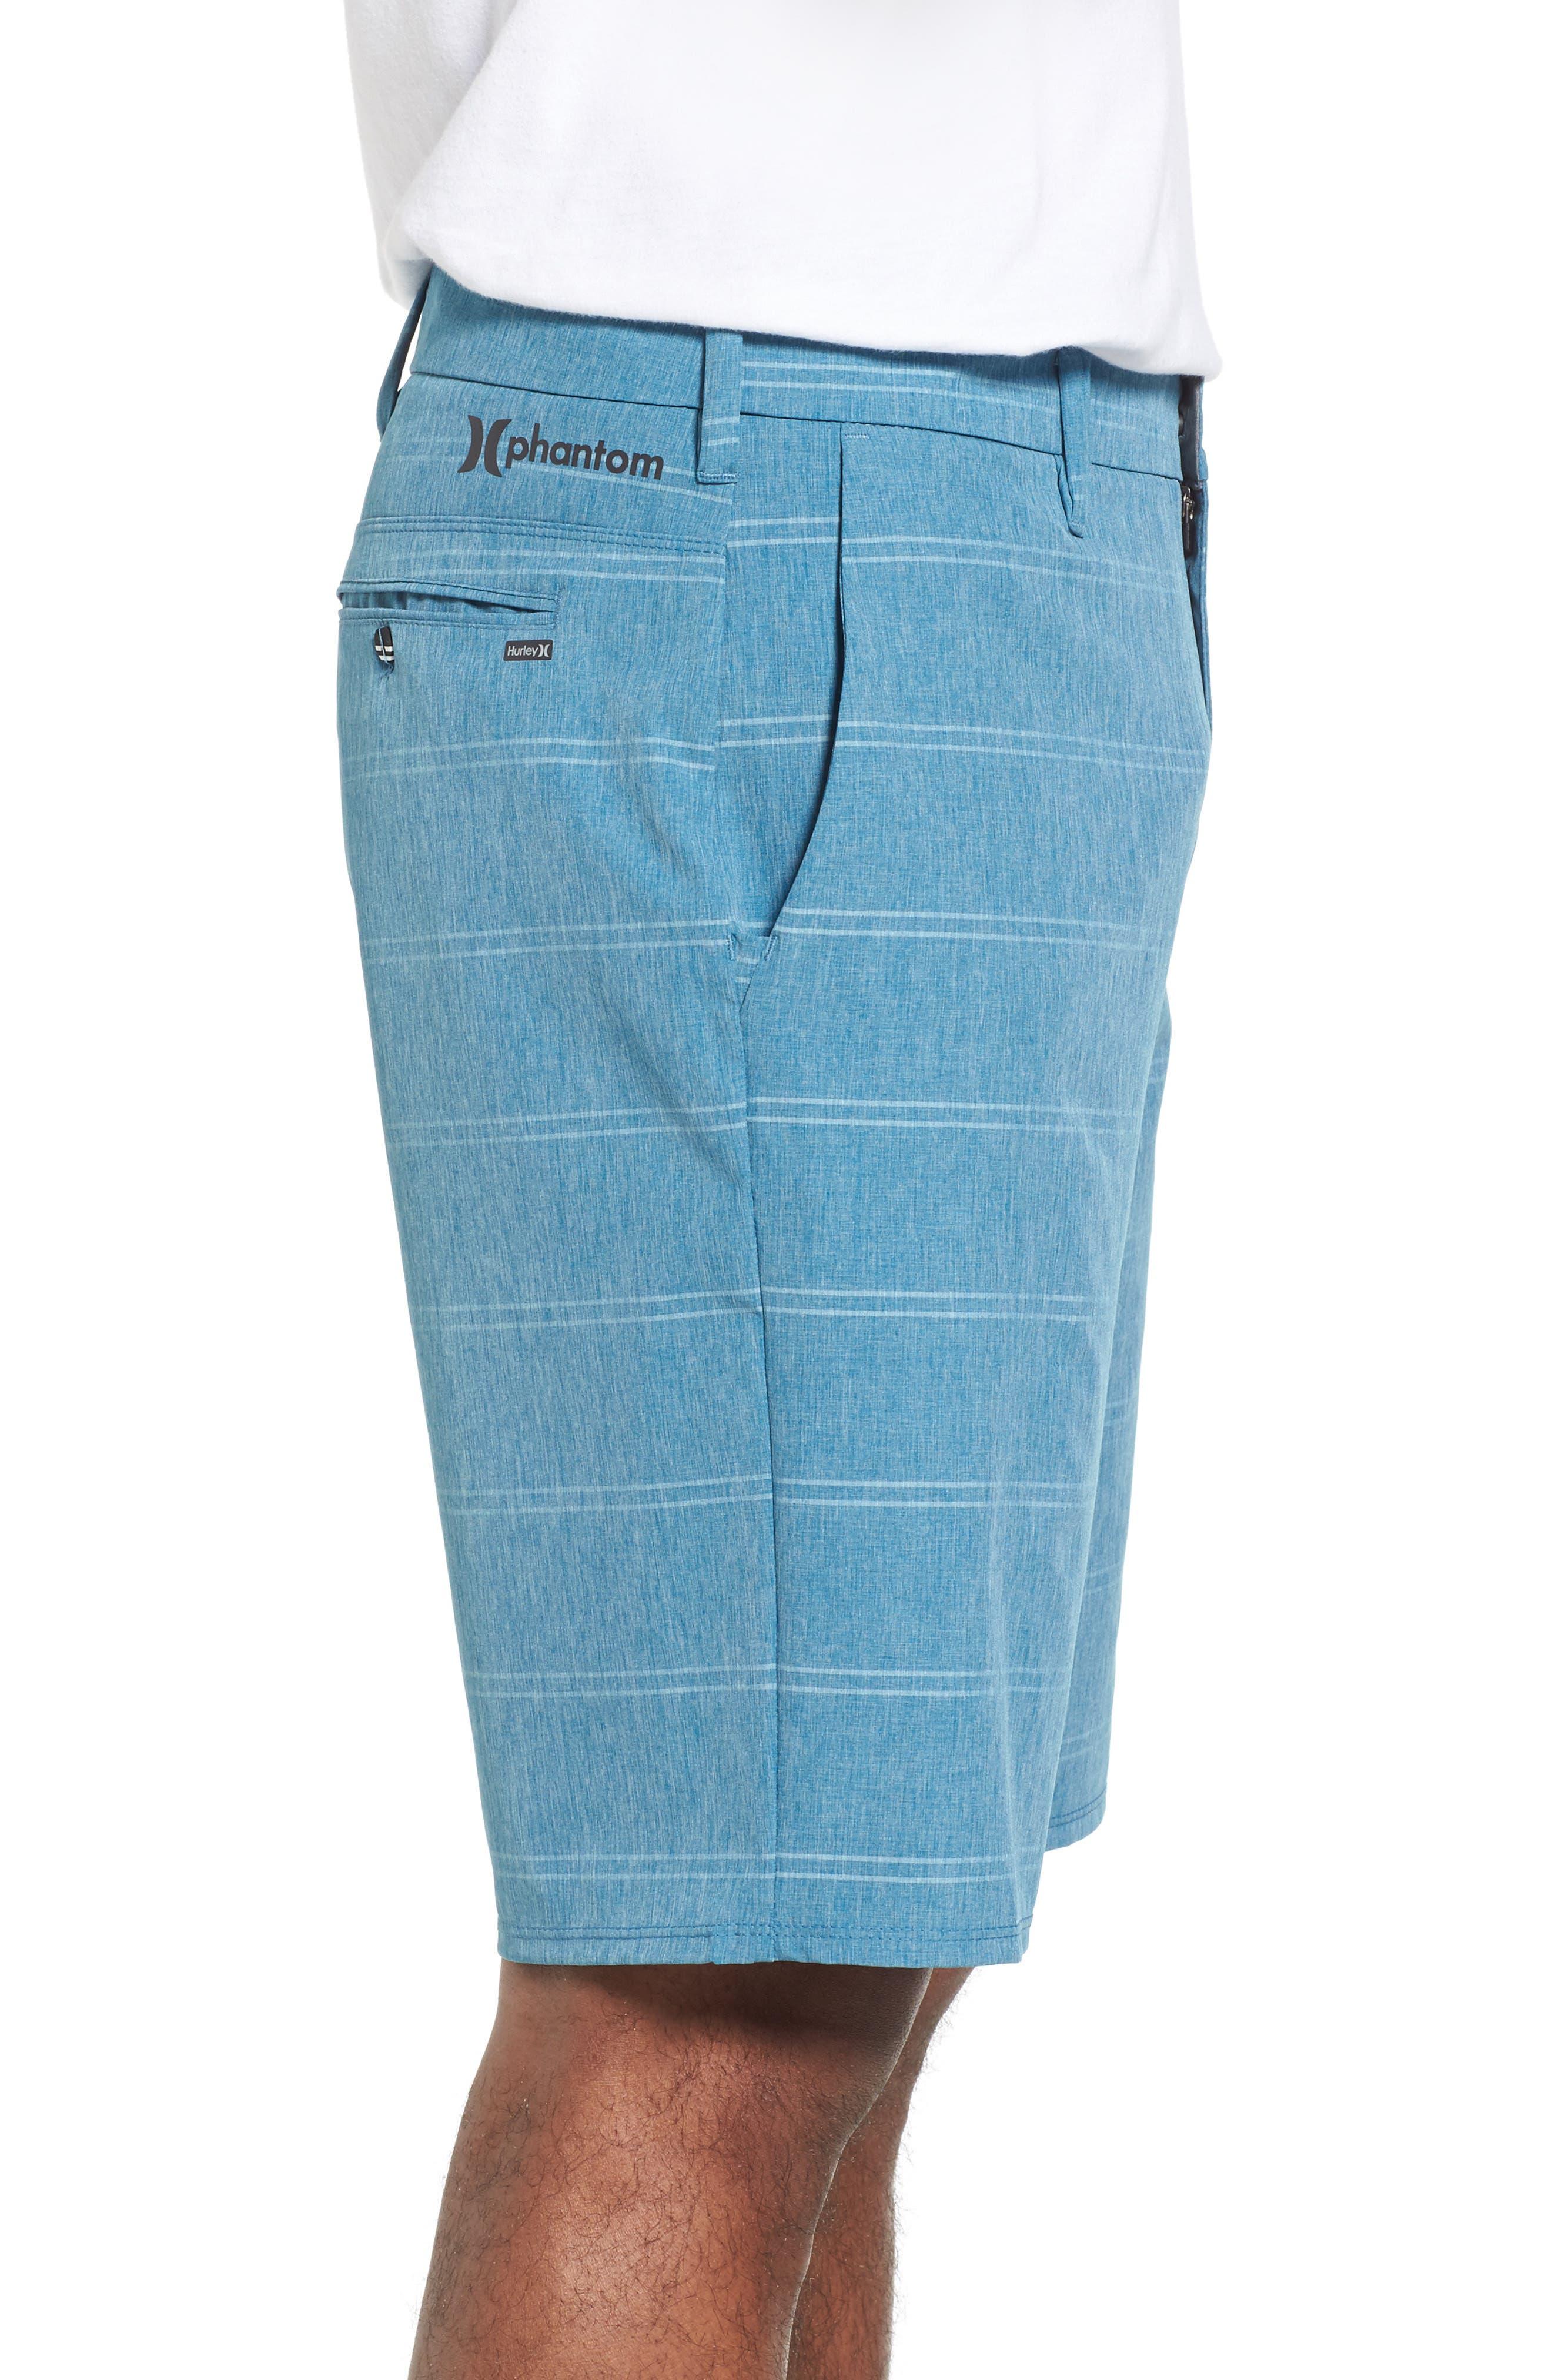 Phantom Hybrid Shorts,                             Alternate thumbnail 3, color,                             Space Blue